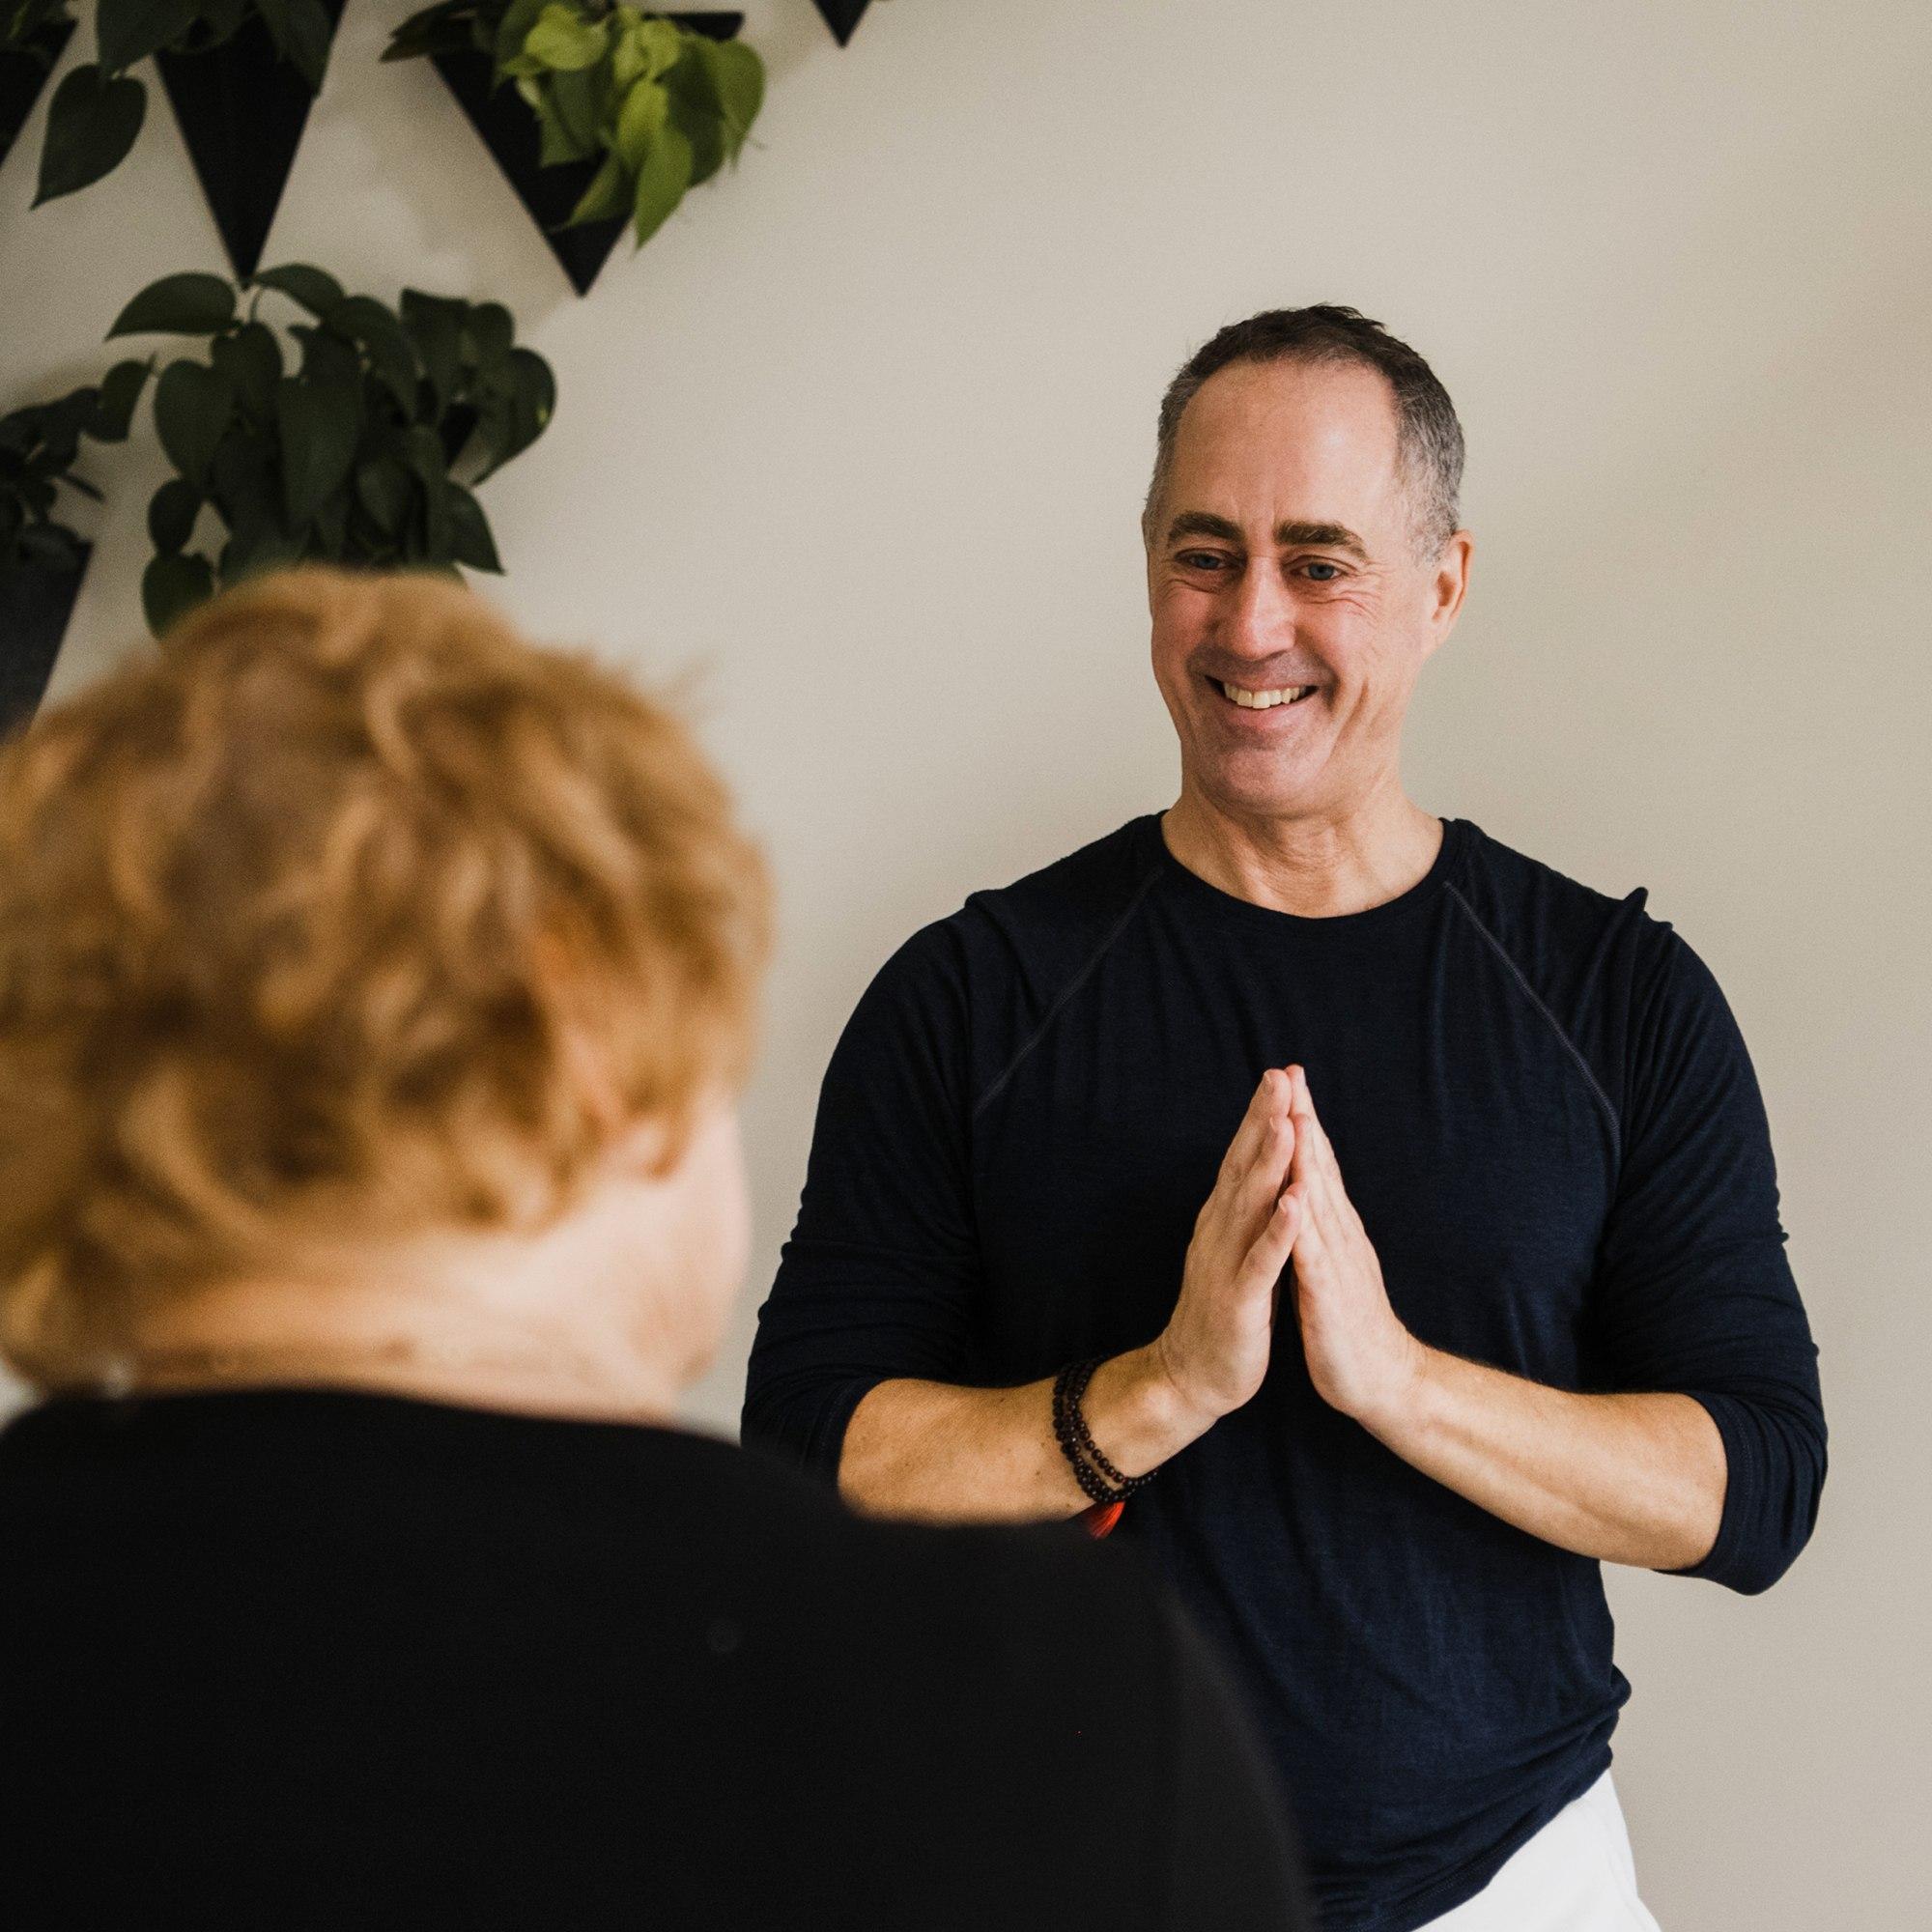 Brian Henderson Kripalu Yoga - Yoga Clinics - Sarovara Yoga - Bobcaygeon